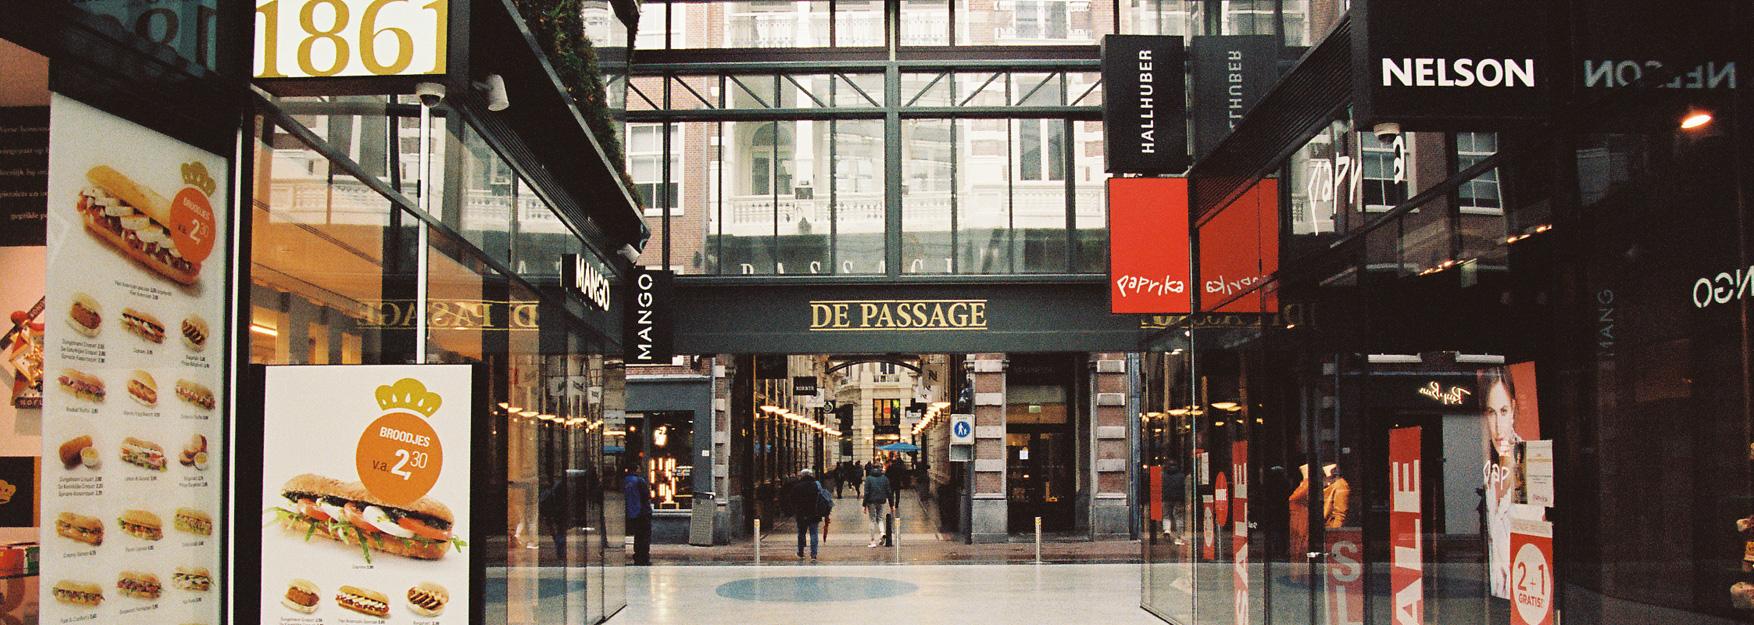 Nieuwe-passage